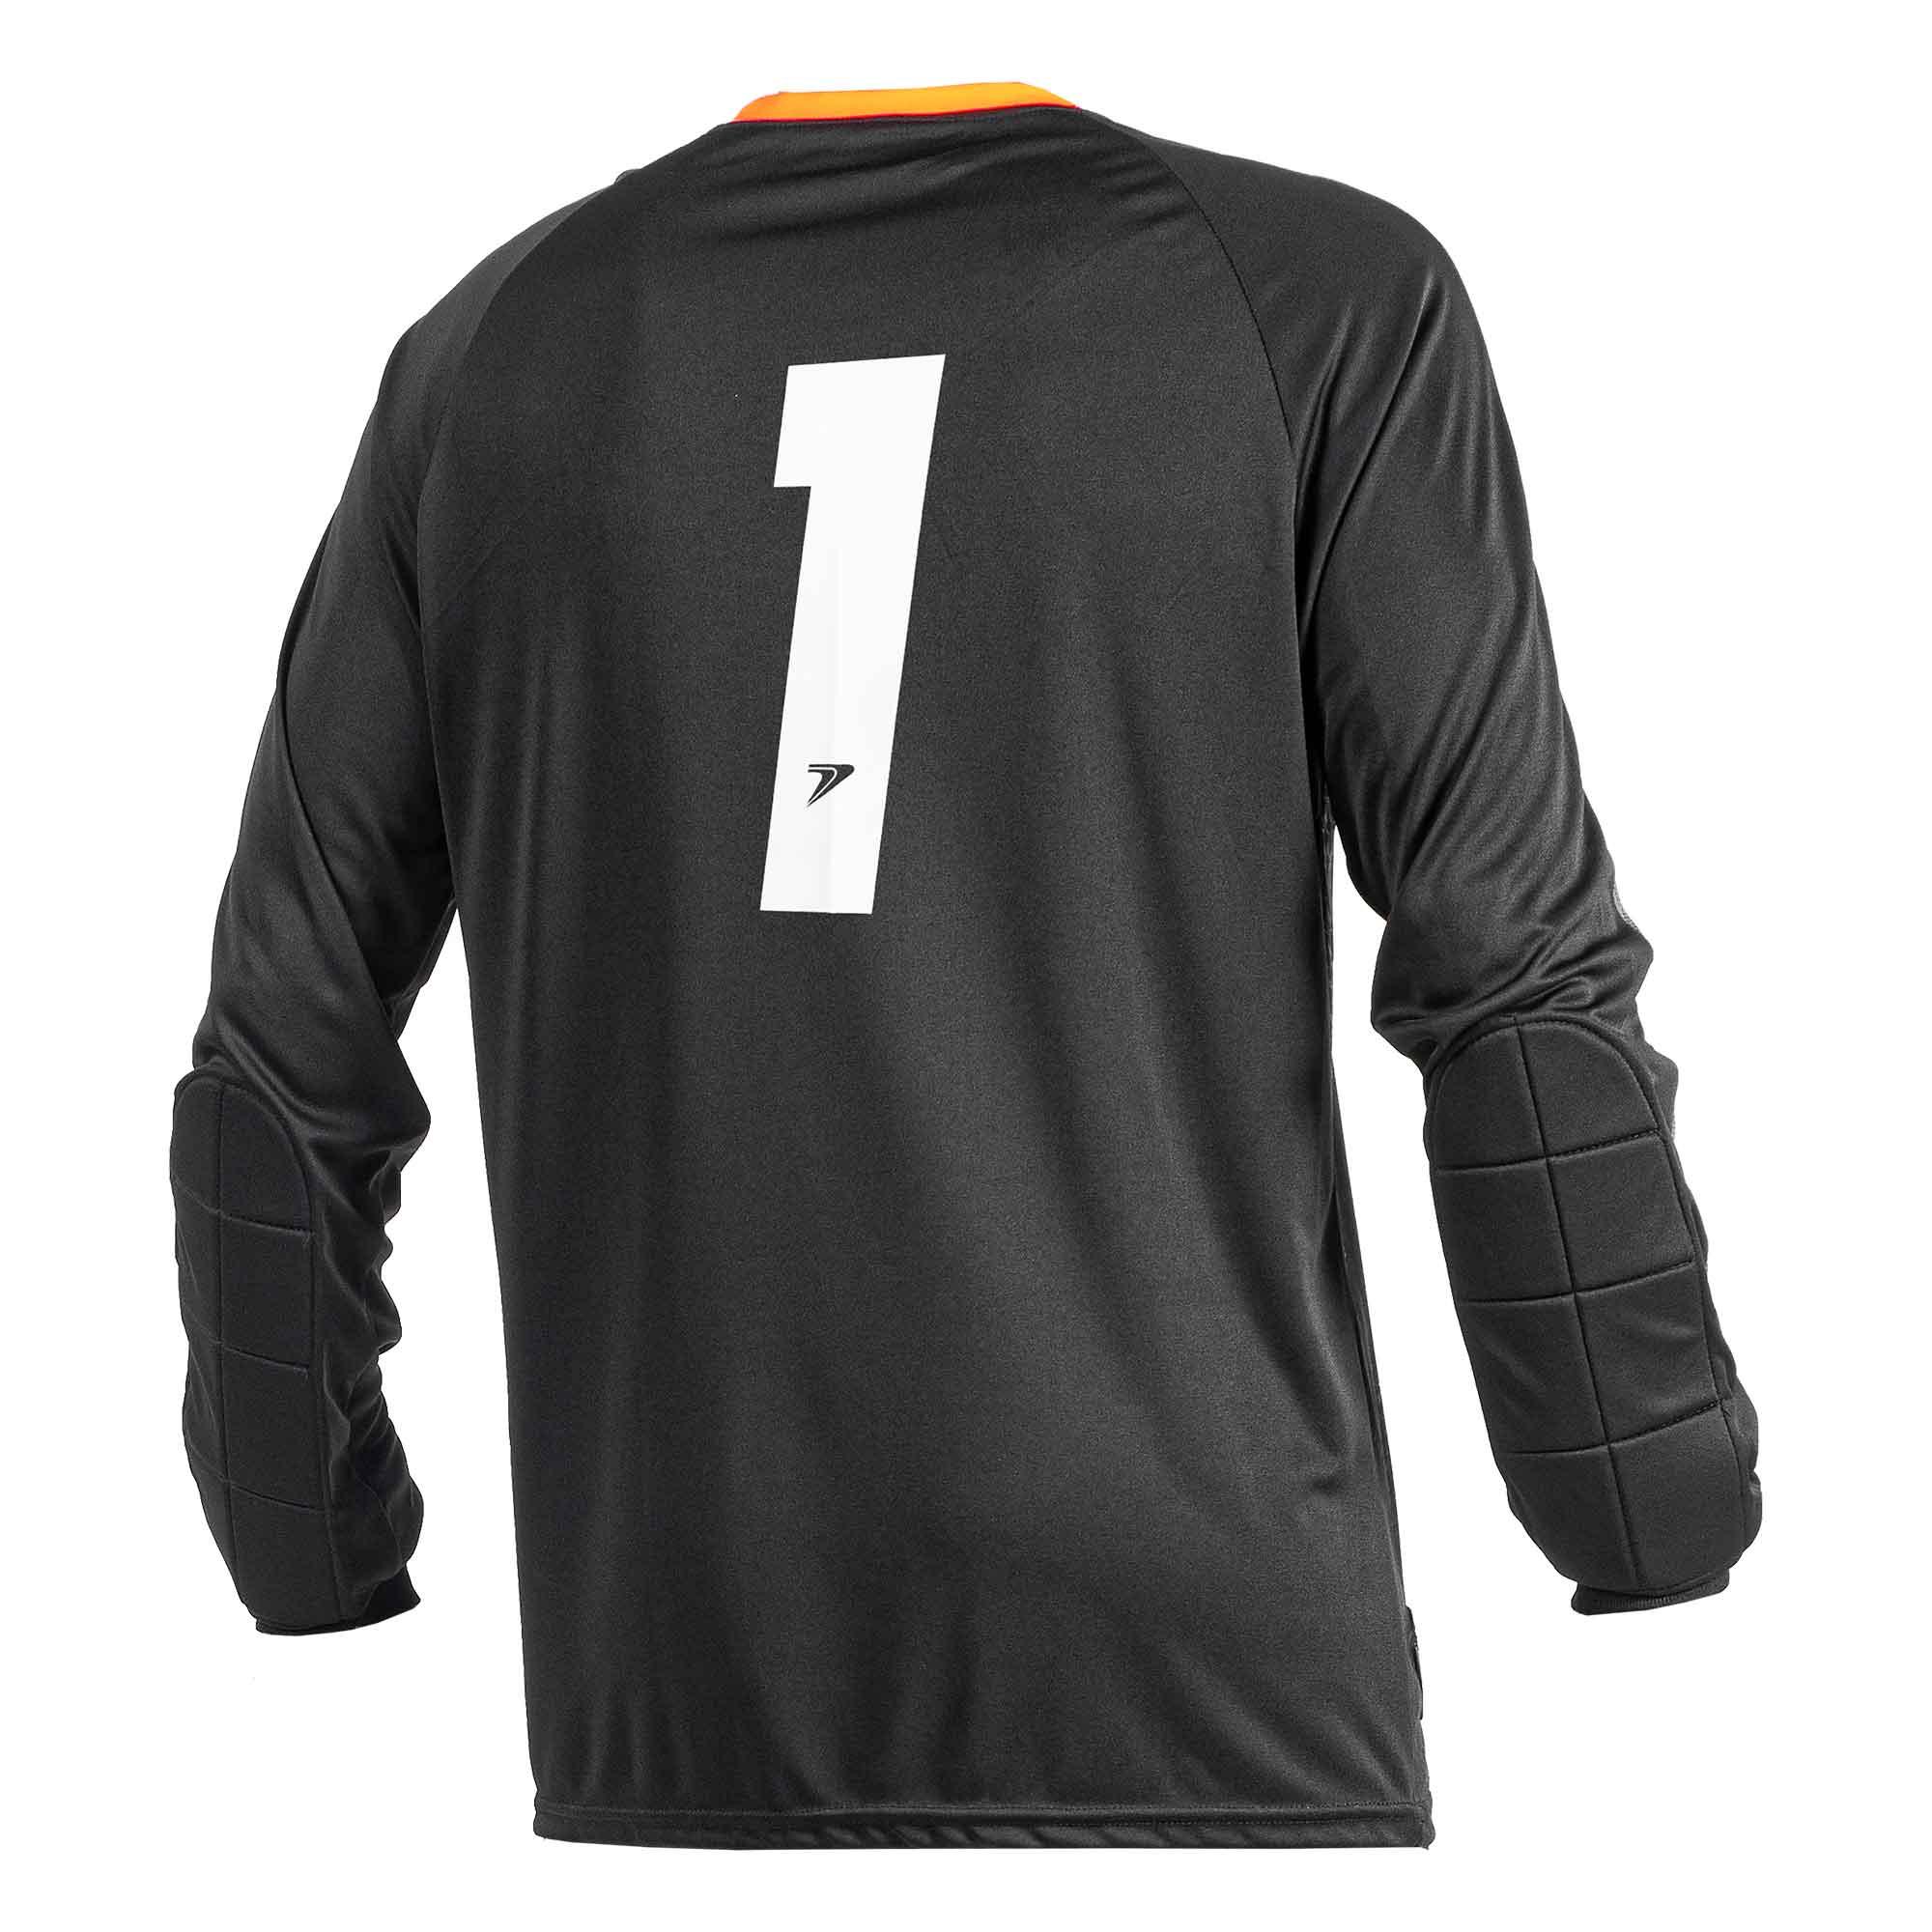 Camisa Gol M/L Sublimax Iron Poker 04152